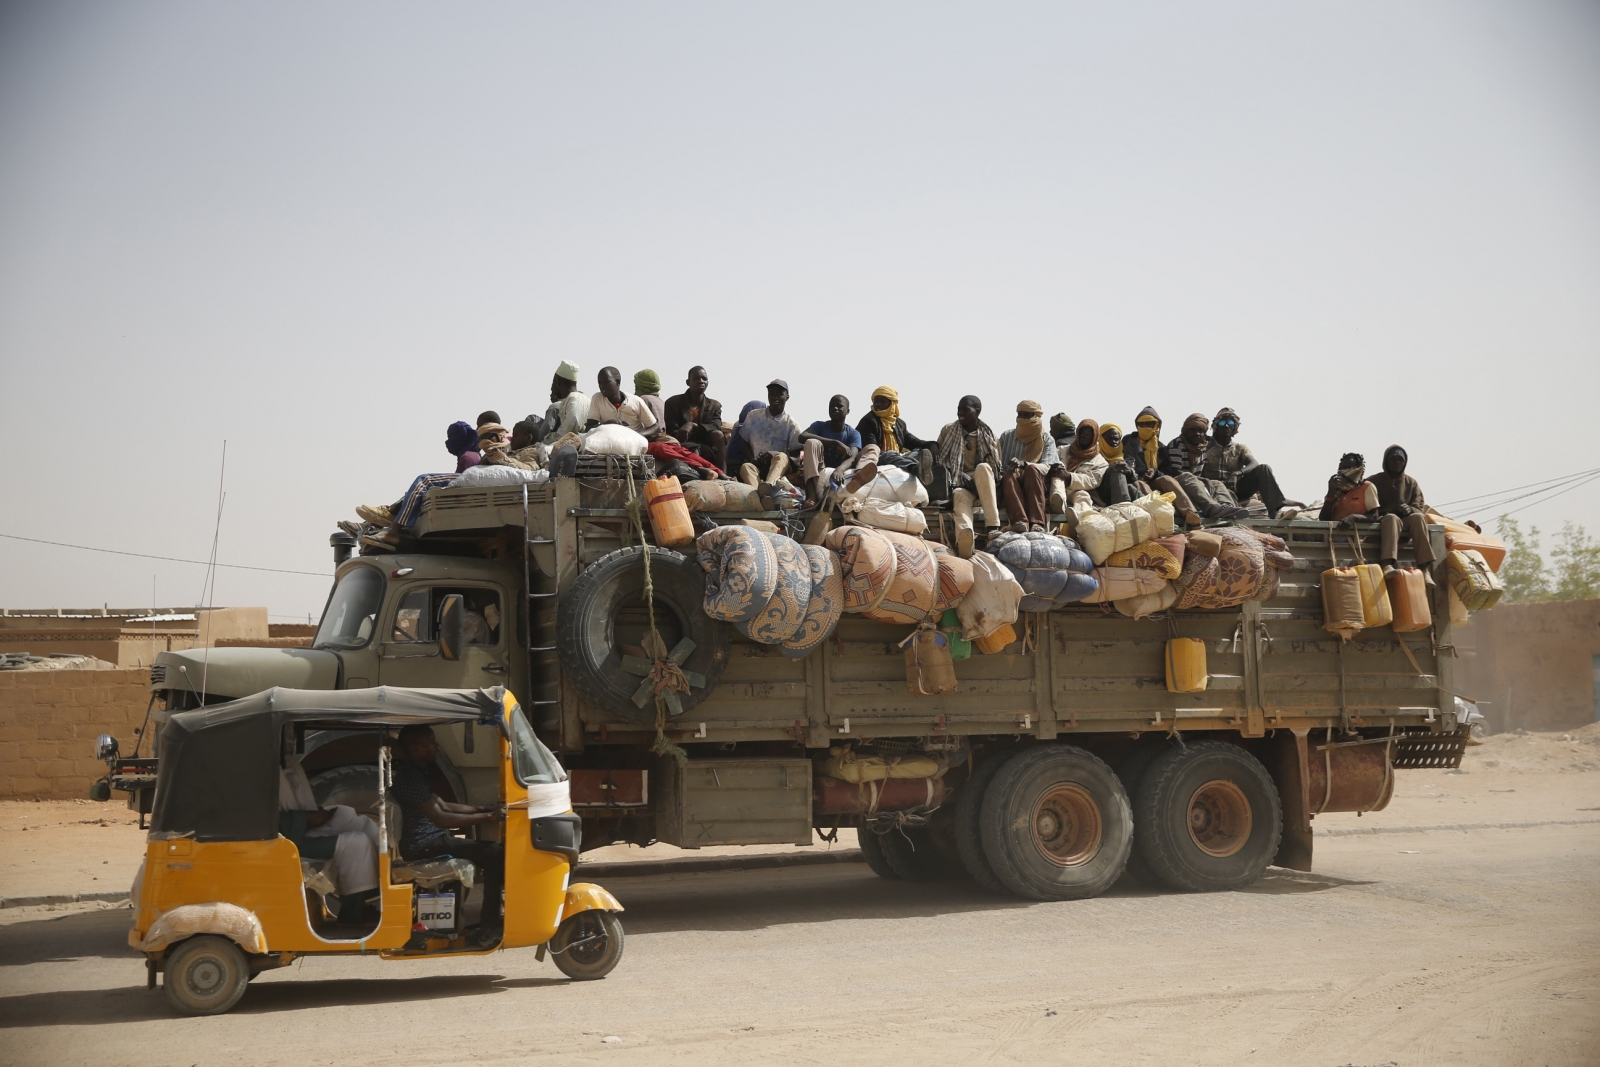 Africa migration and Nigeria